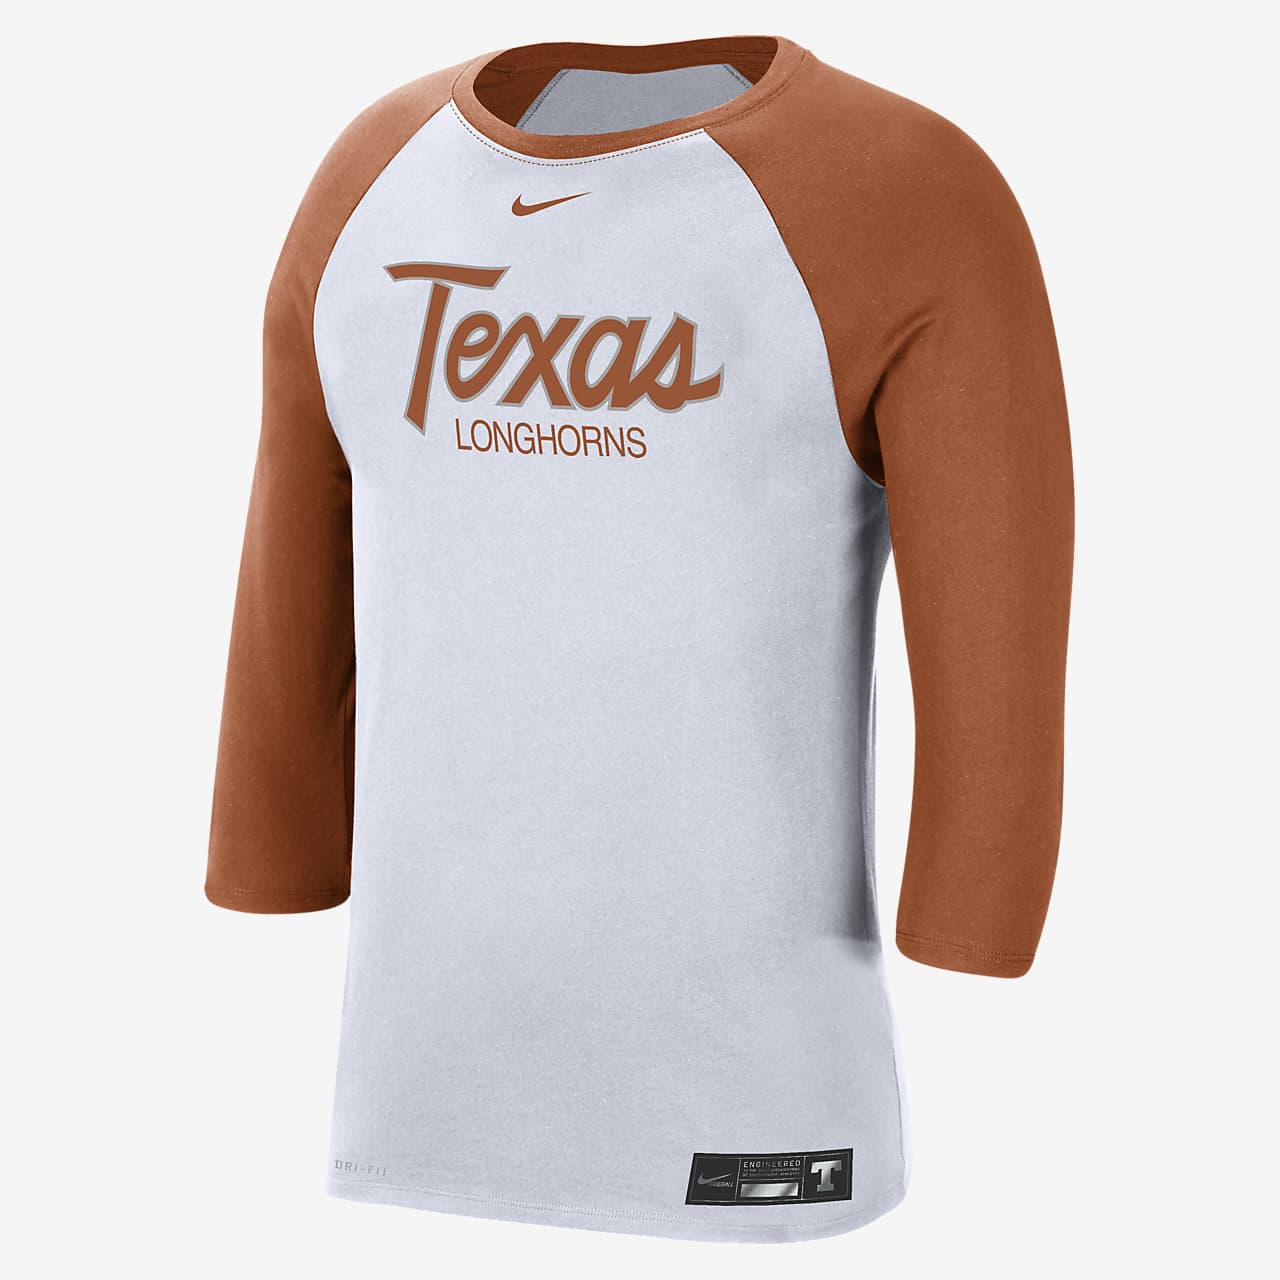 Nike College Dri-FIT (Texas) Men's 3/4-Sleeve T-Shirt